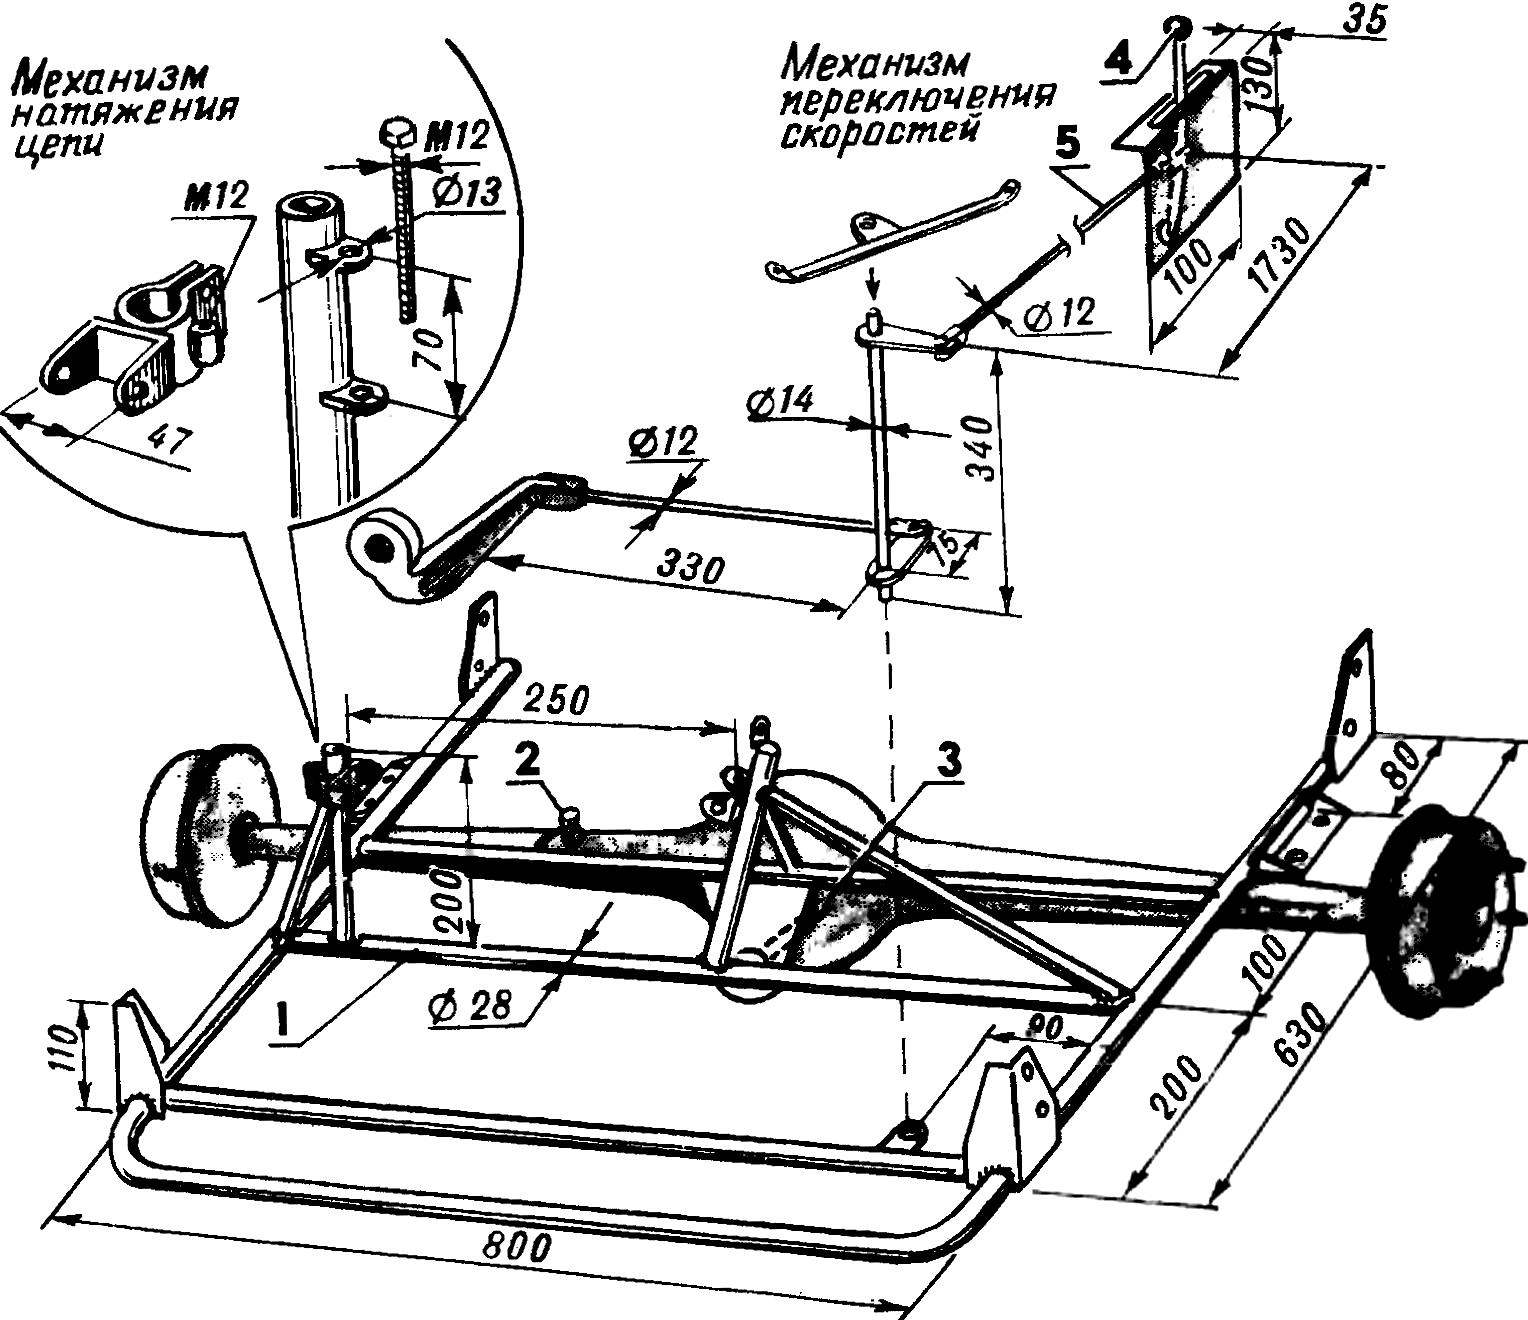 Fig. 6. the sub-frame